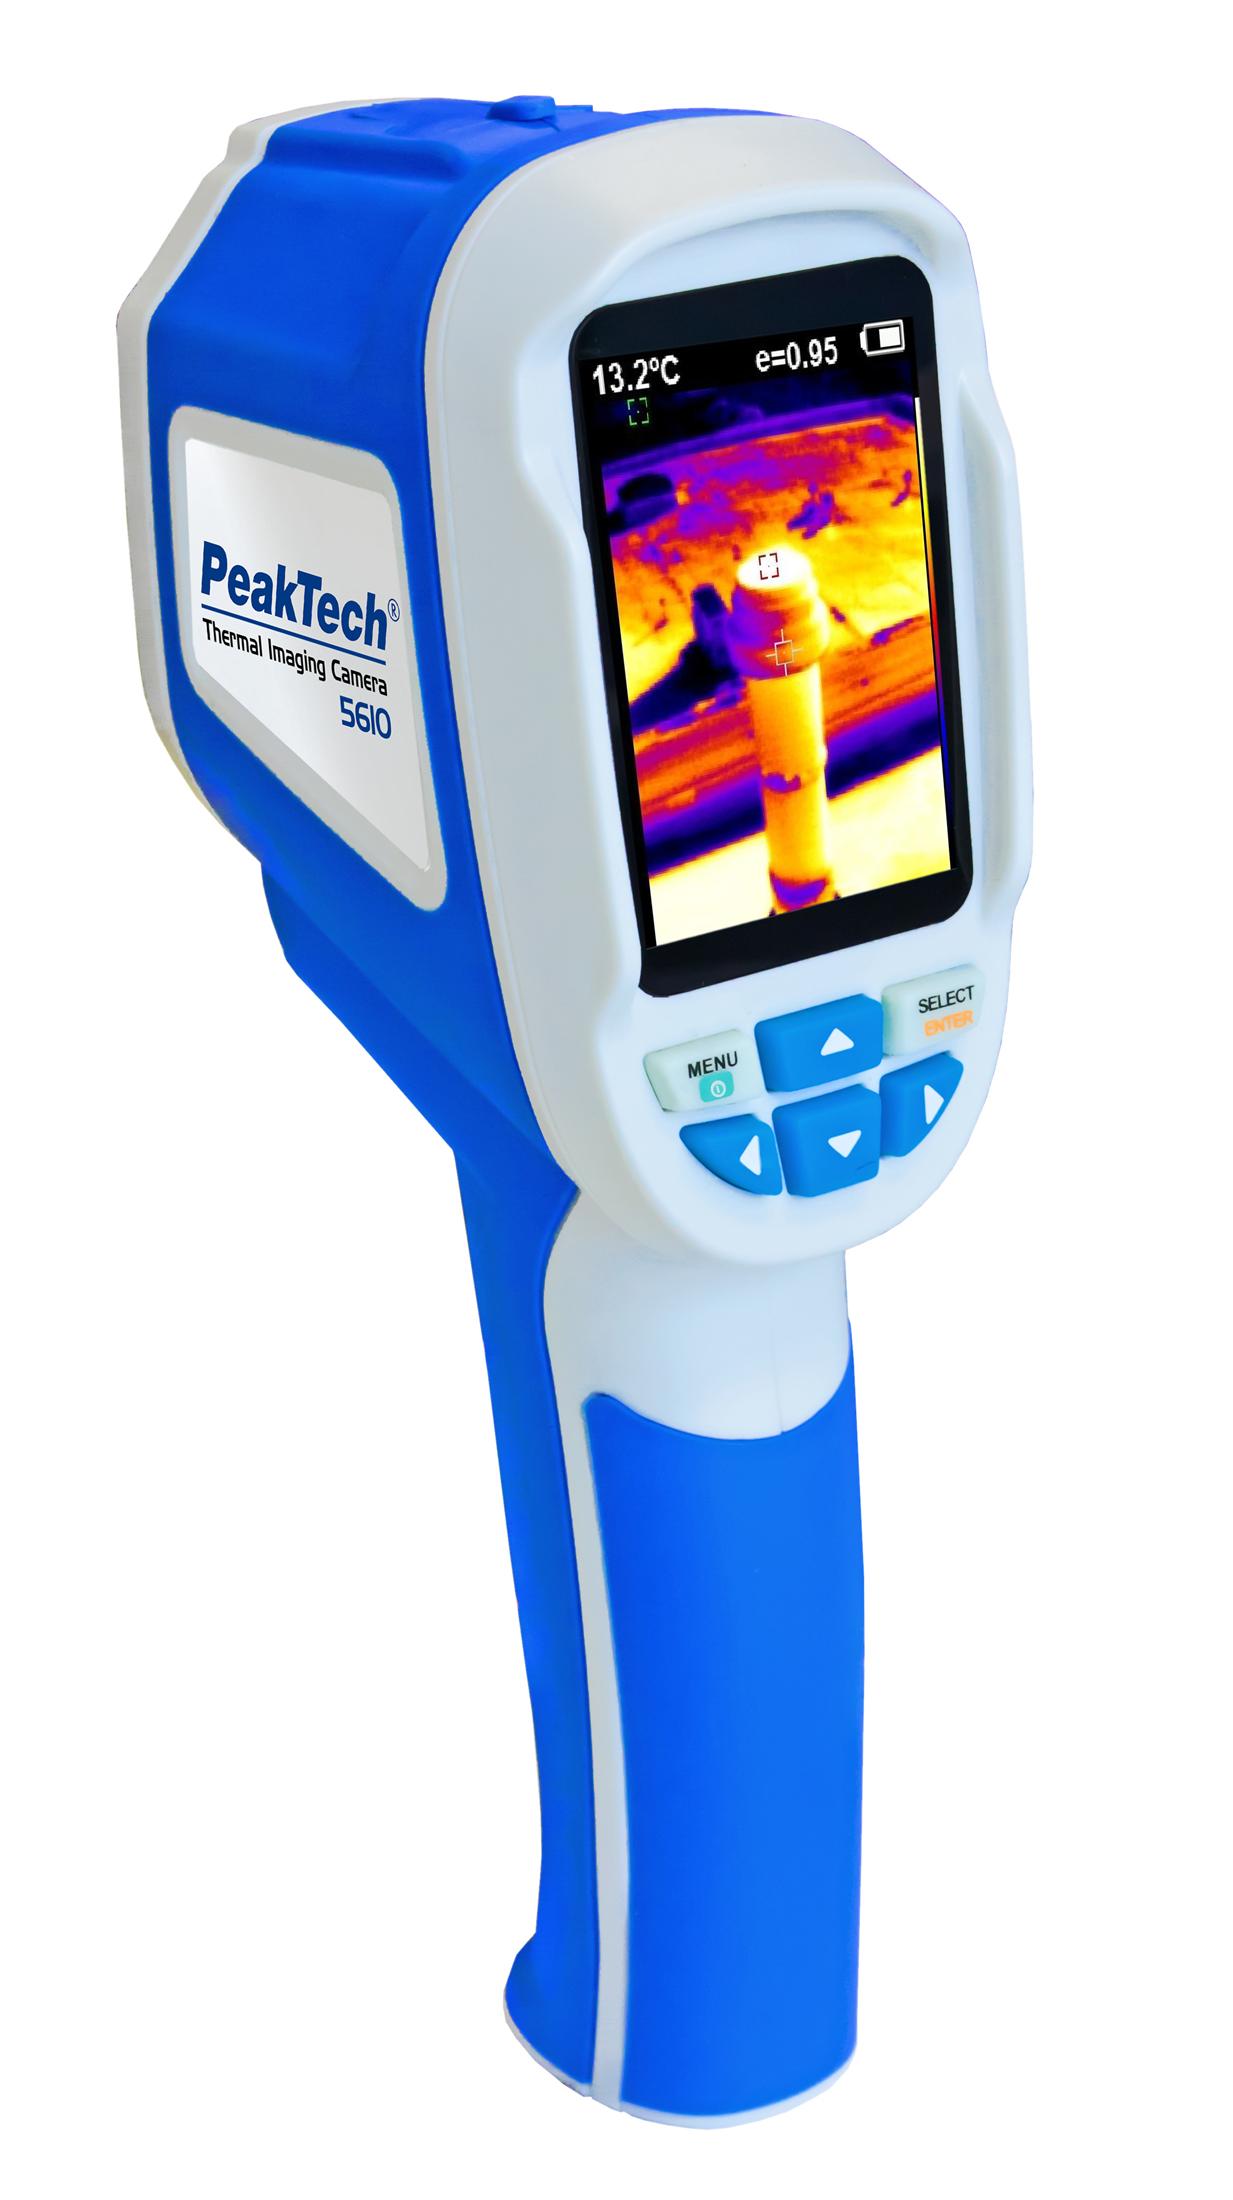 Pirometr i kamera termowizyjna PeakTech 5610